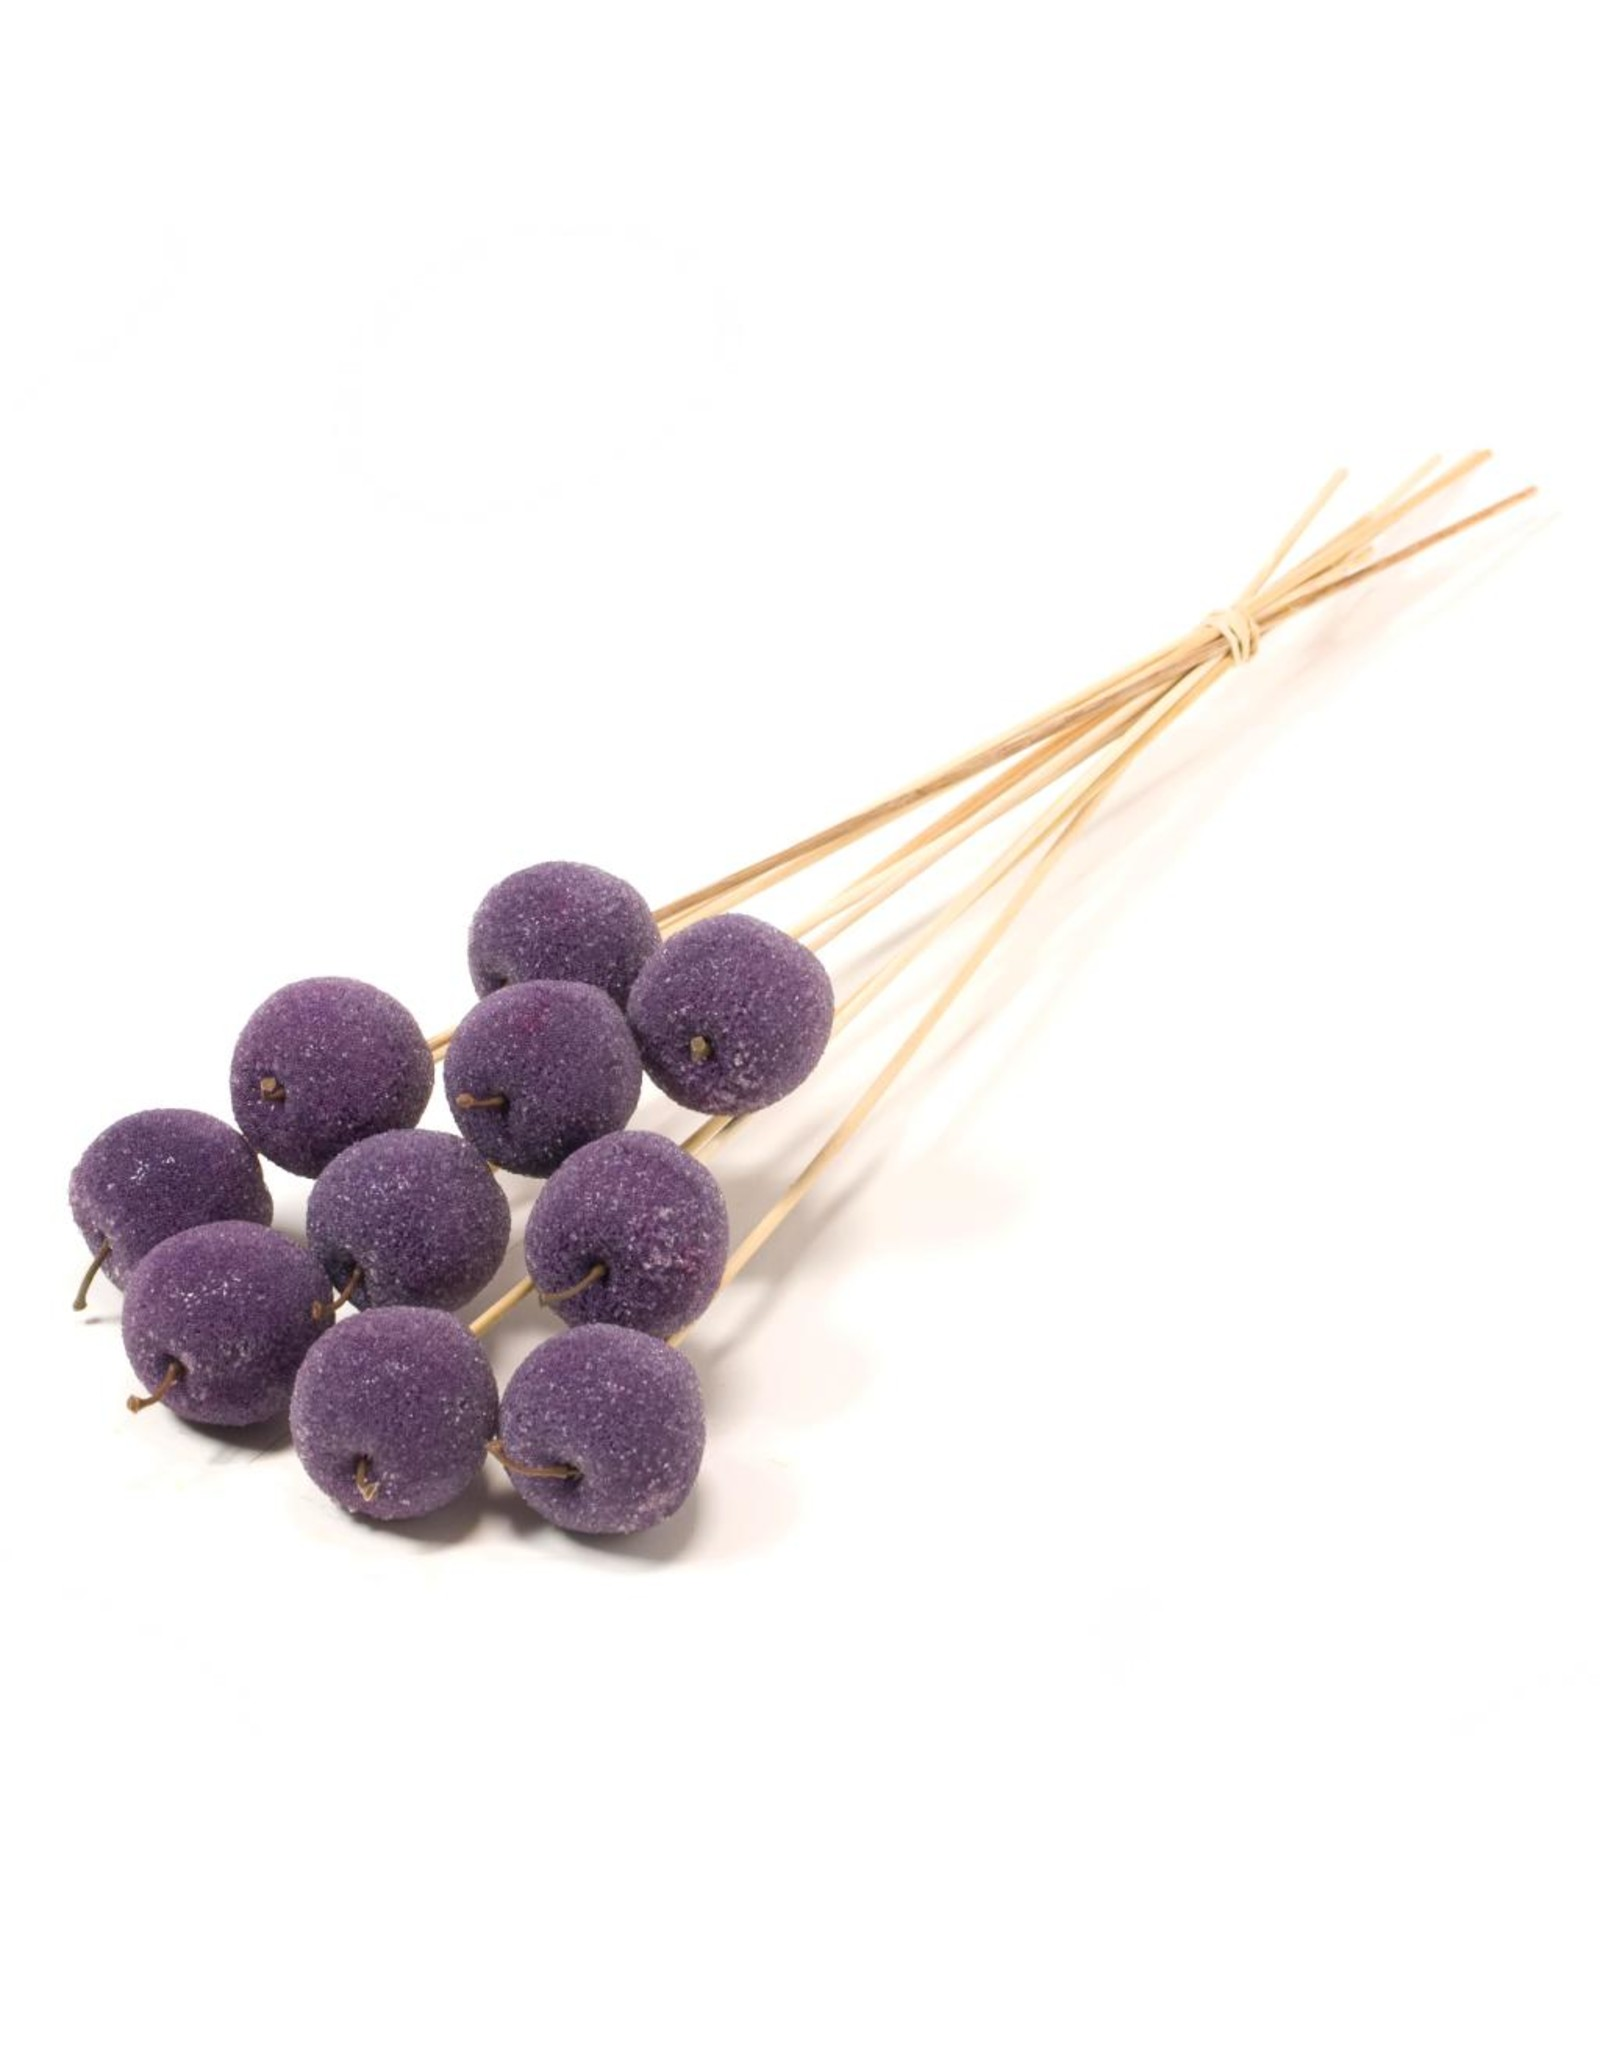 LDD Apple sugar 5cm o/s 10pc purple x 20